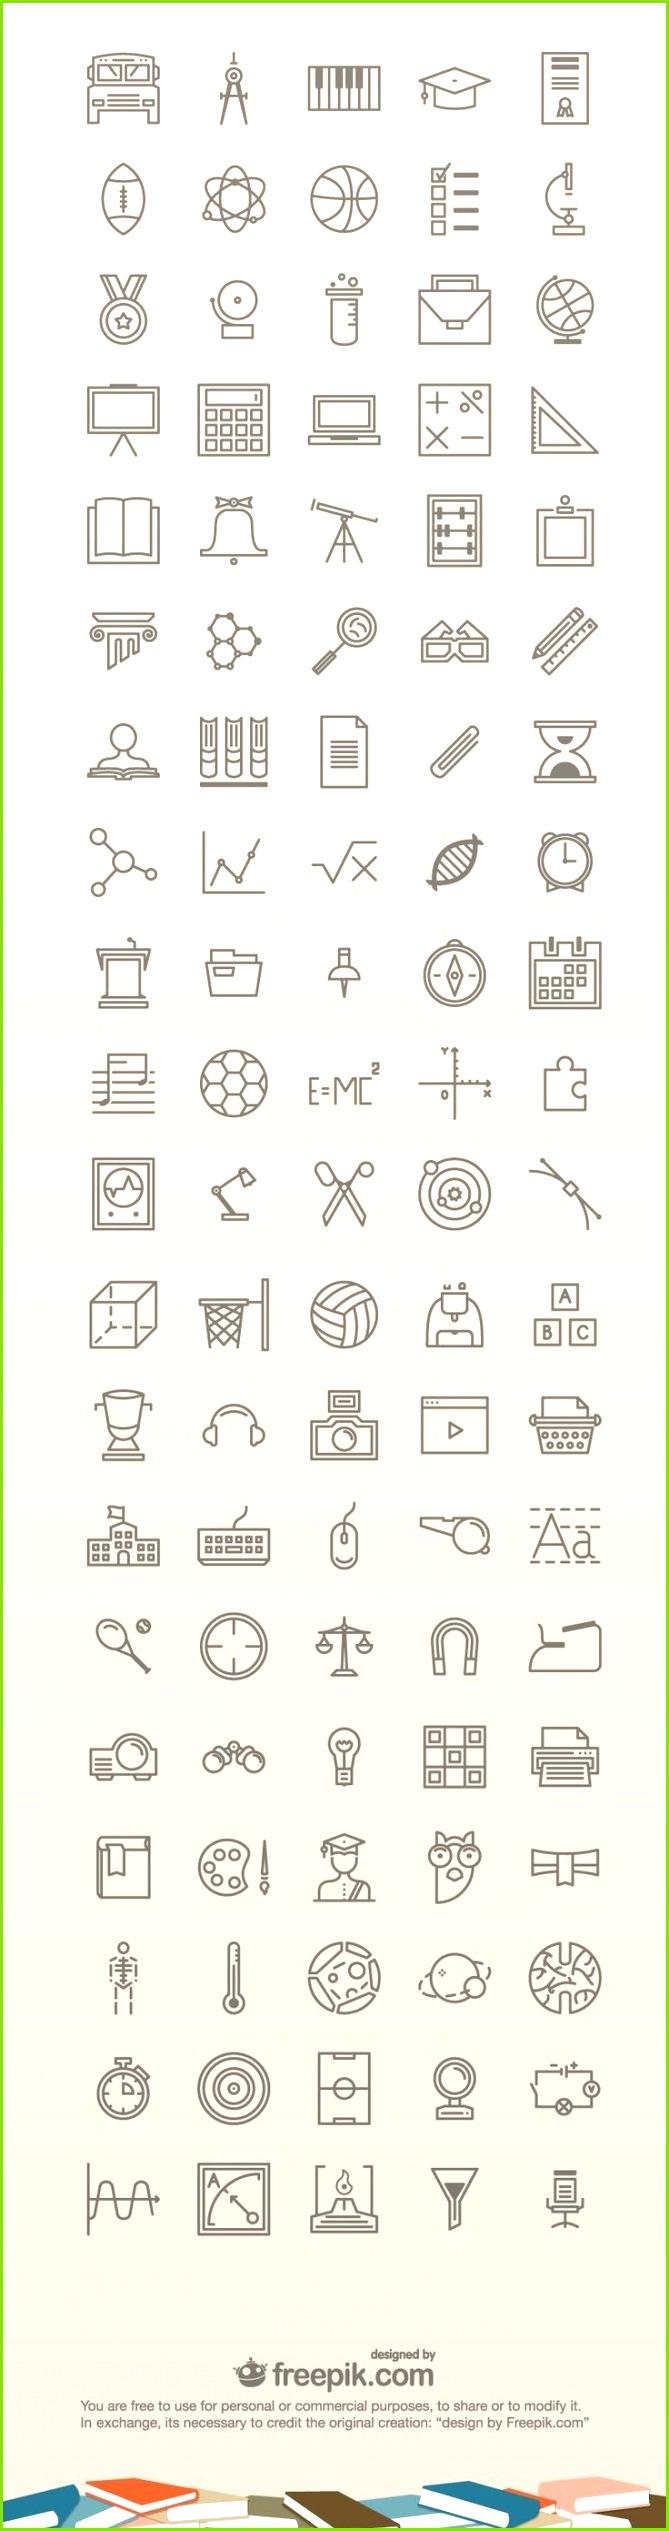 100 Free Education Icons